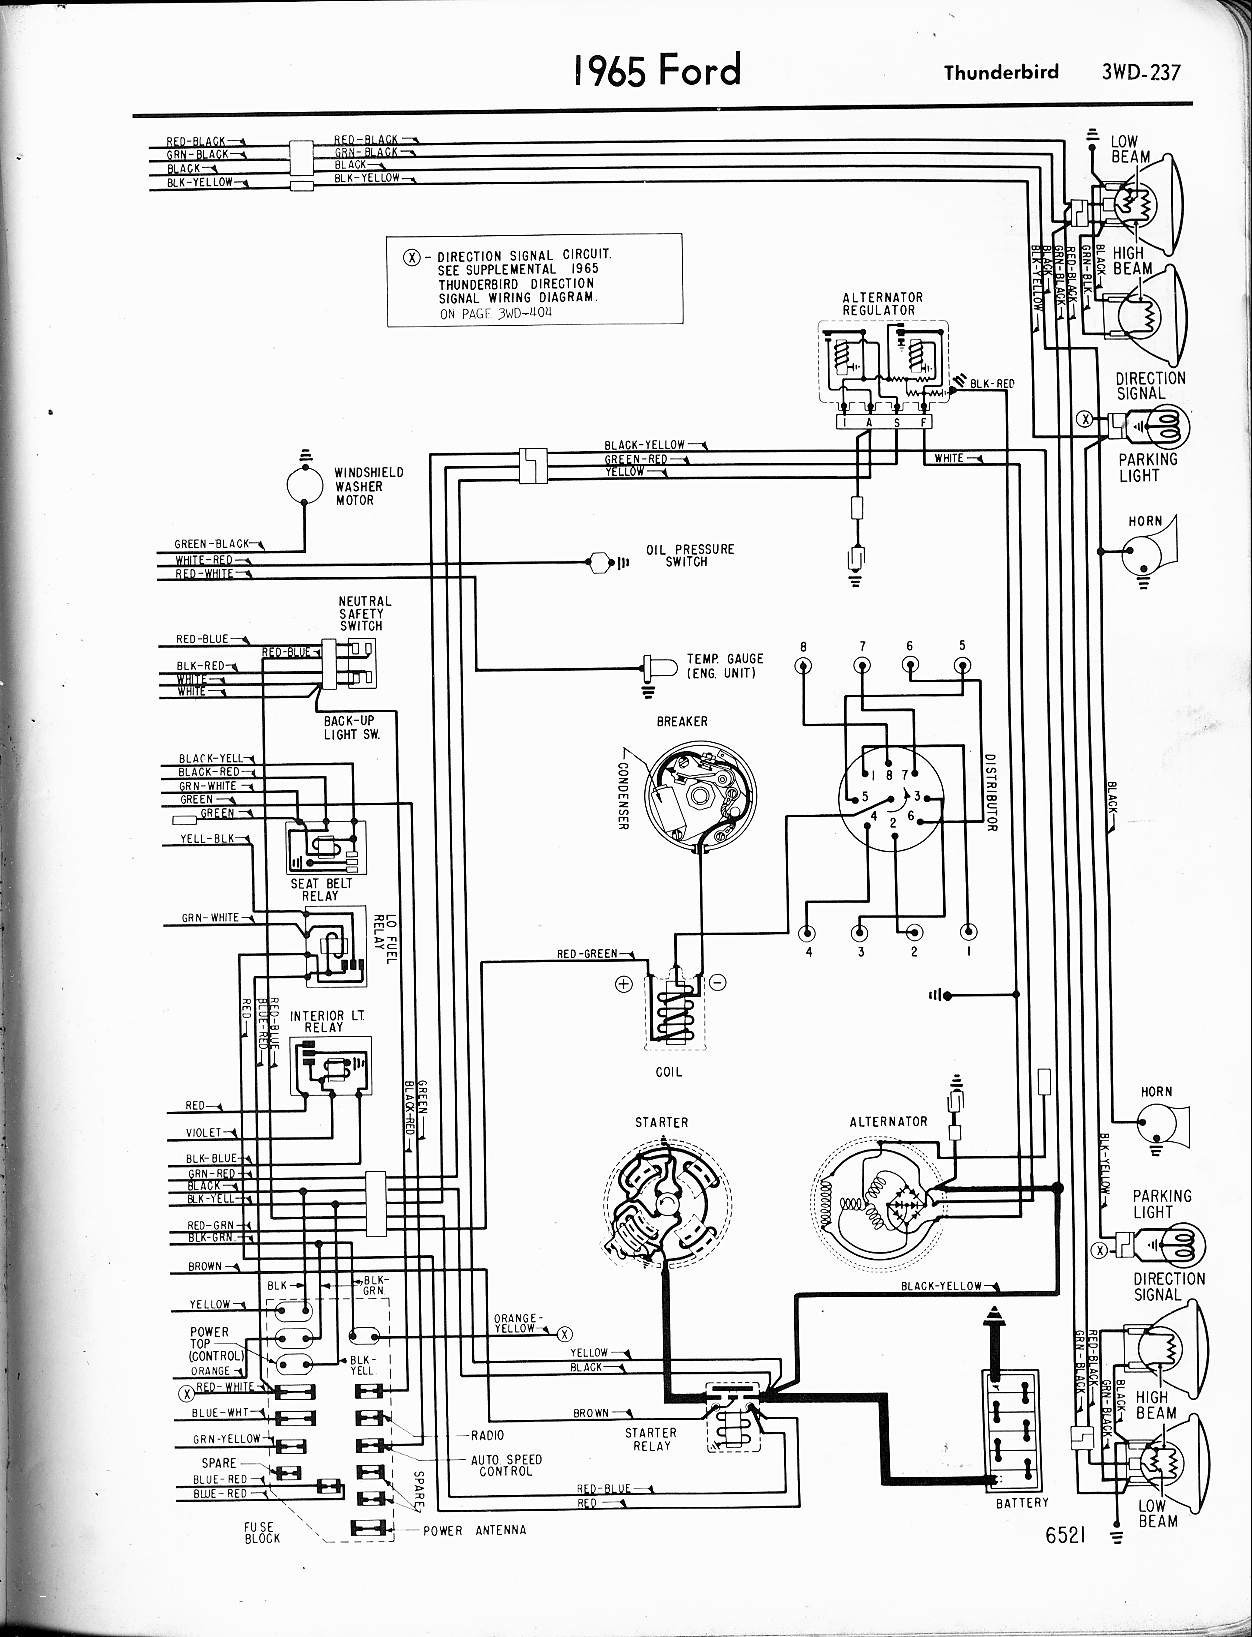 Circuit Diagram Battery Unique Diagram Wiring ford Econoline Wiring Diagram  Alternator Truck Tail wiring diagram john deere l100 ...